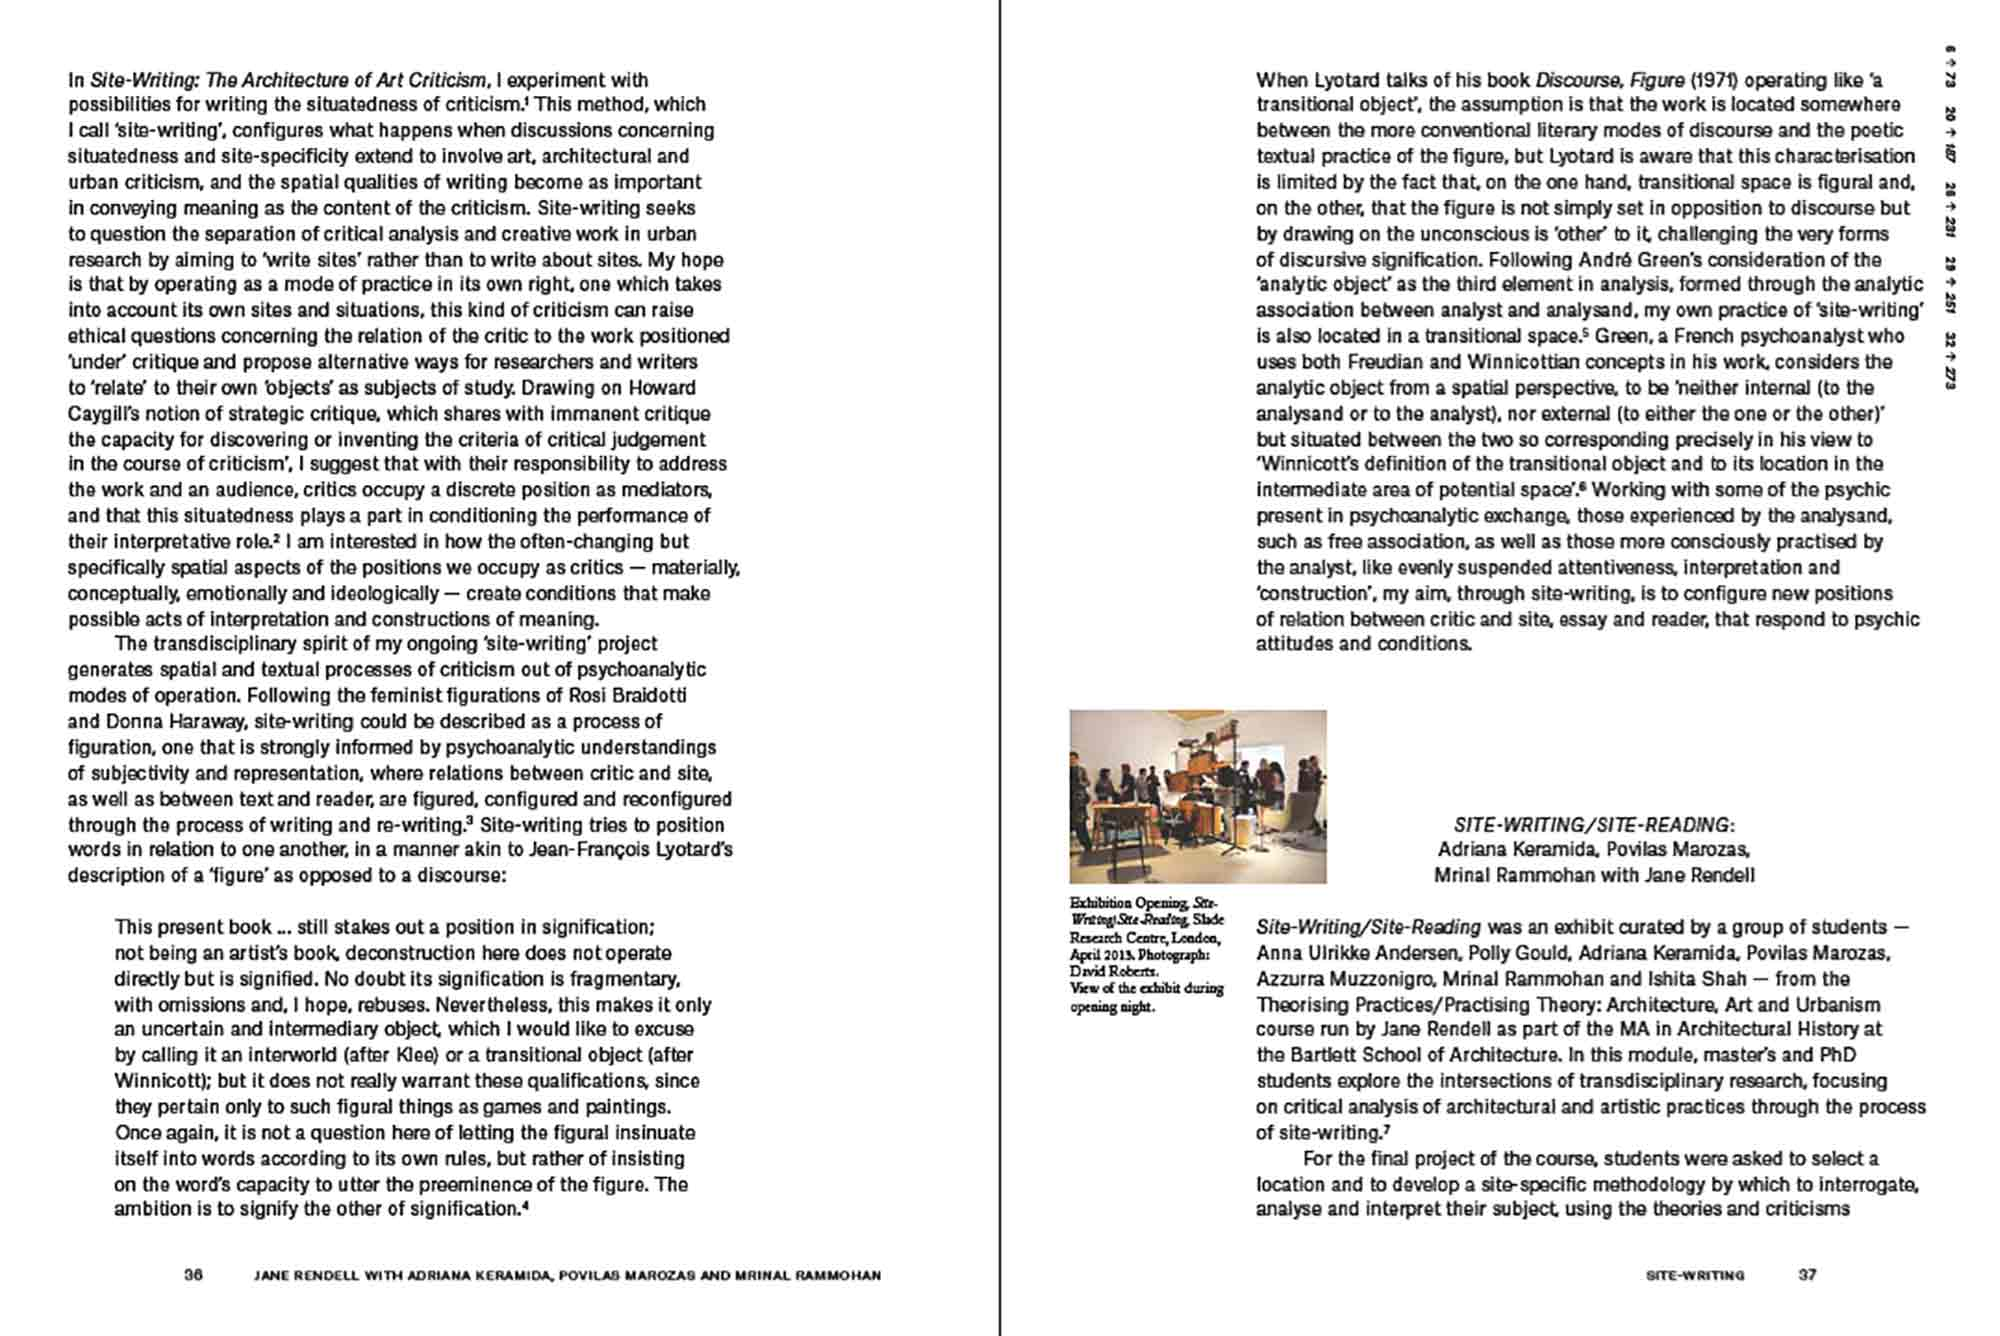 Site-Writing_Site-Reading-Engaged-Urbanism-36-7